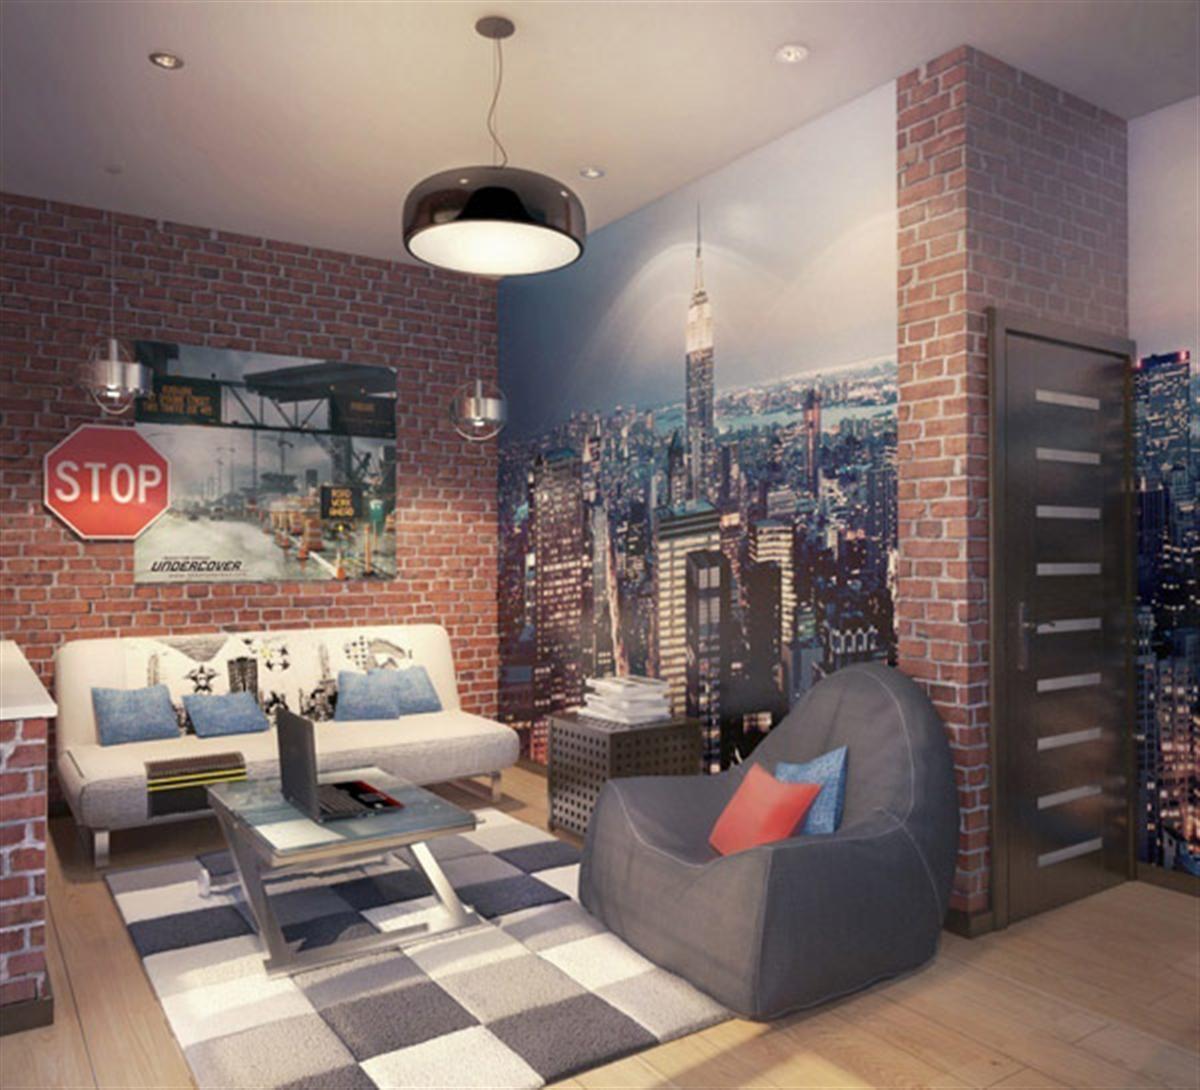 new york style bedroom - Google Search | Boys room | Pinterest